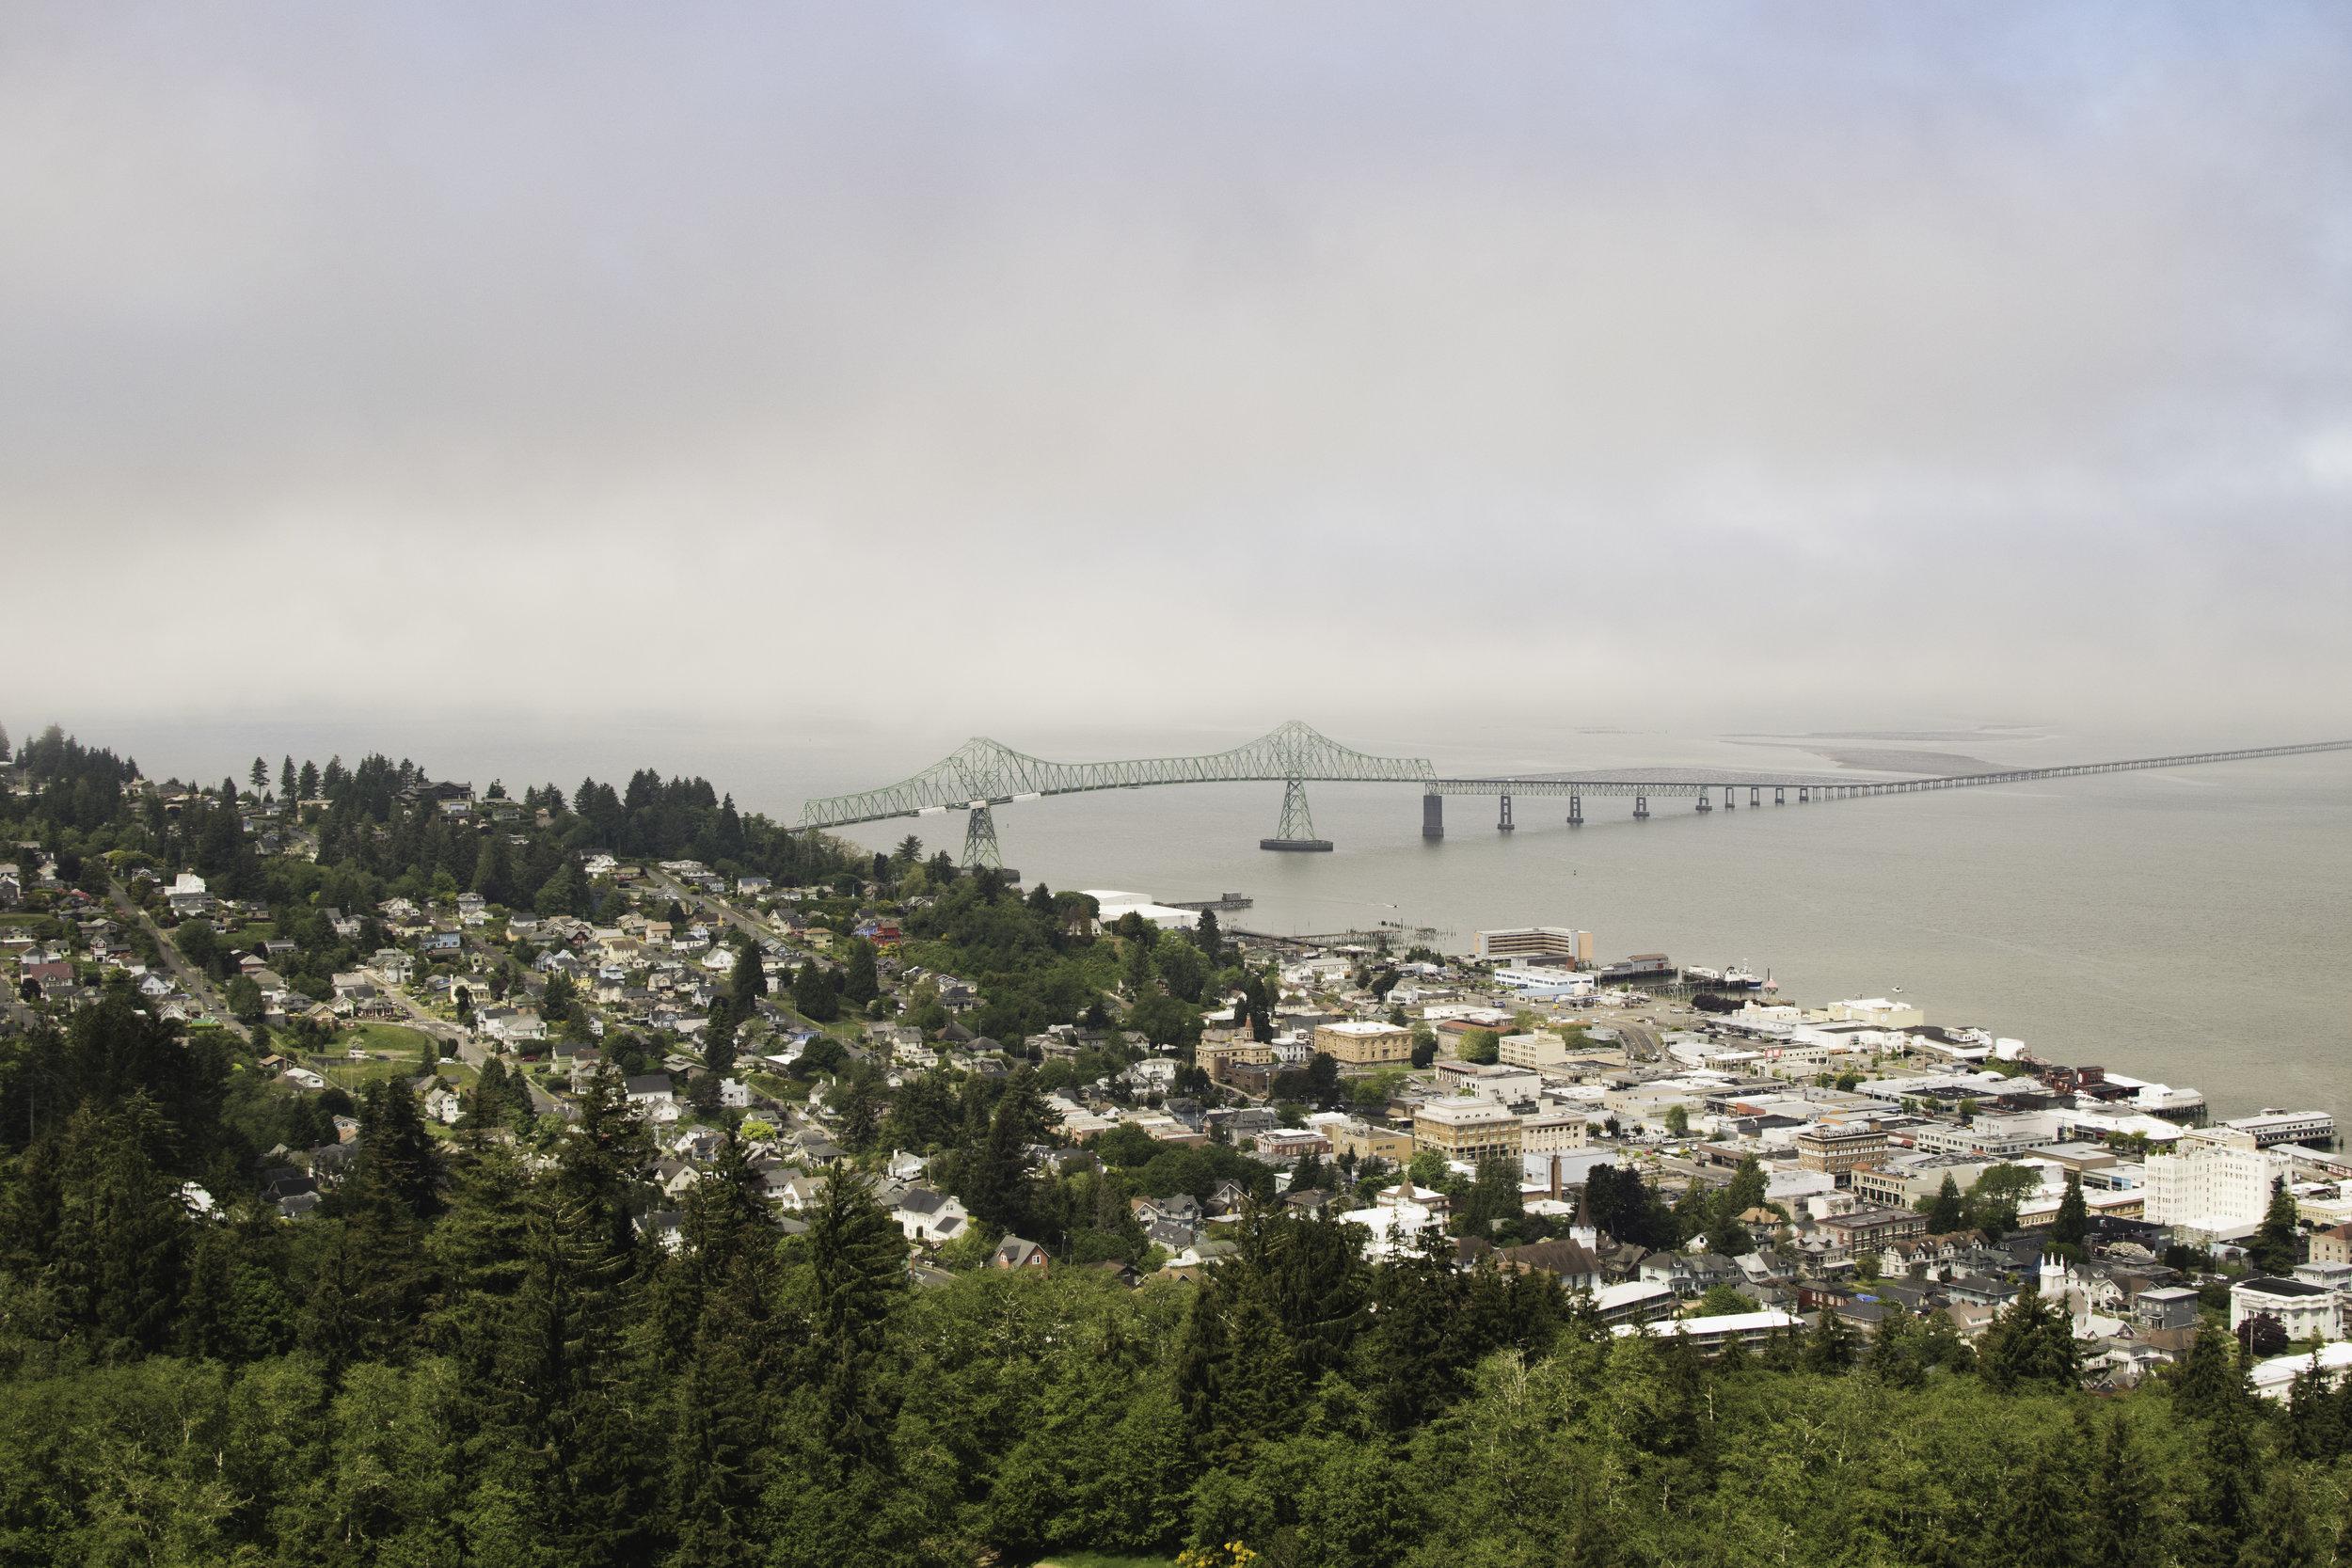 bay and bridge.jpg